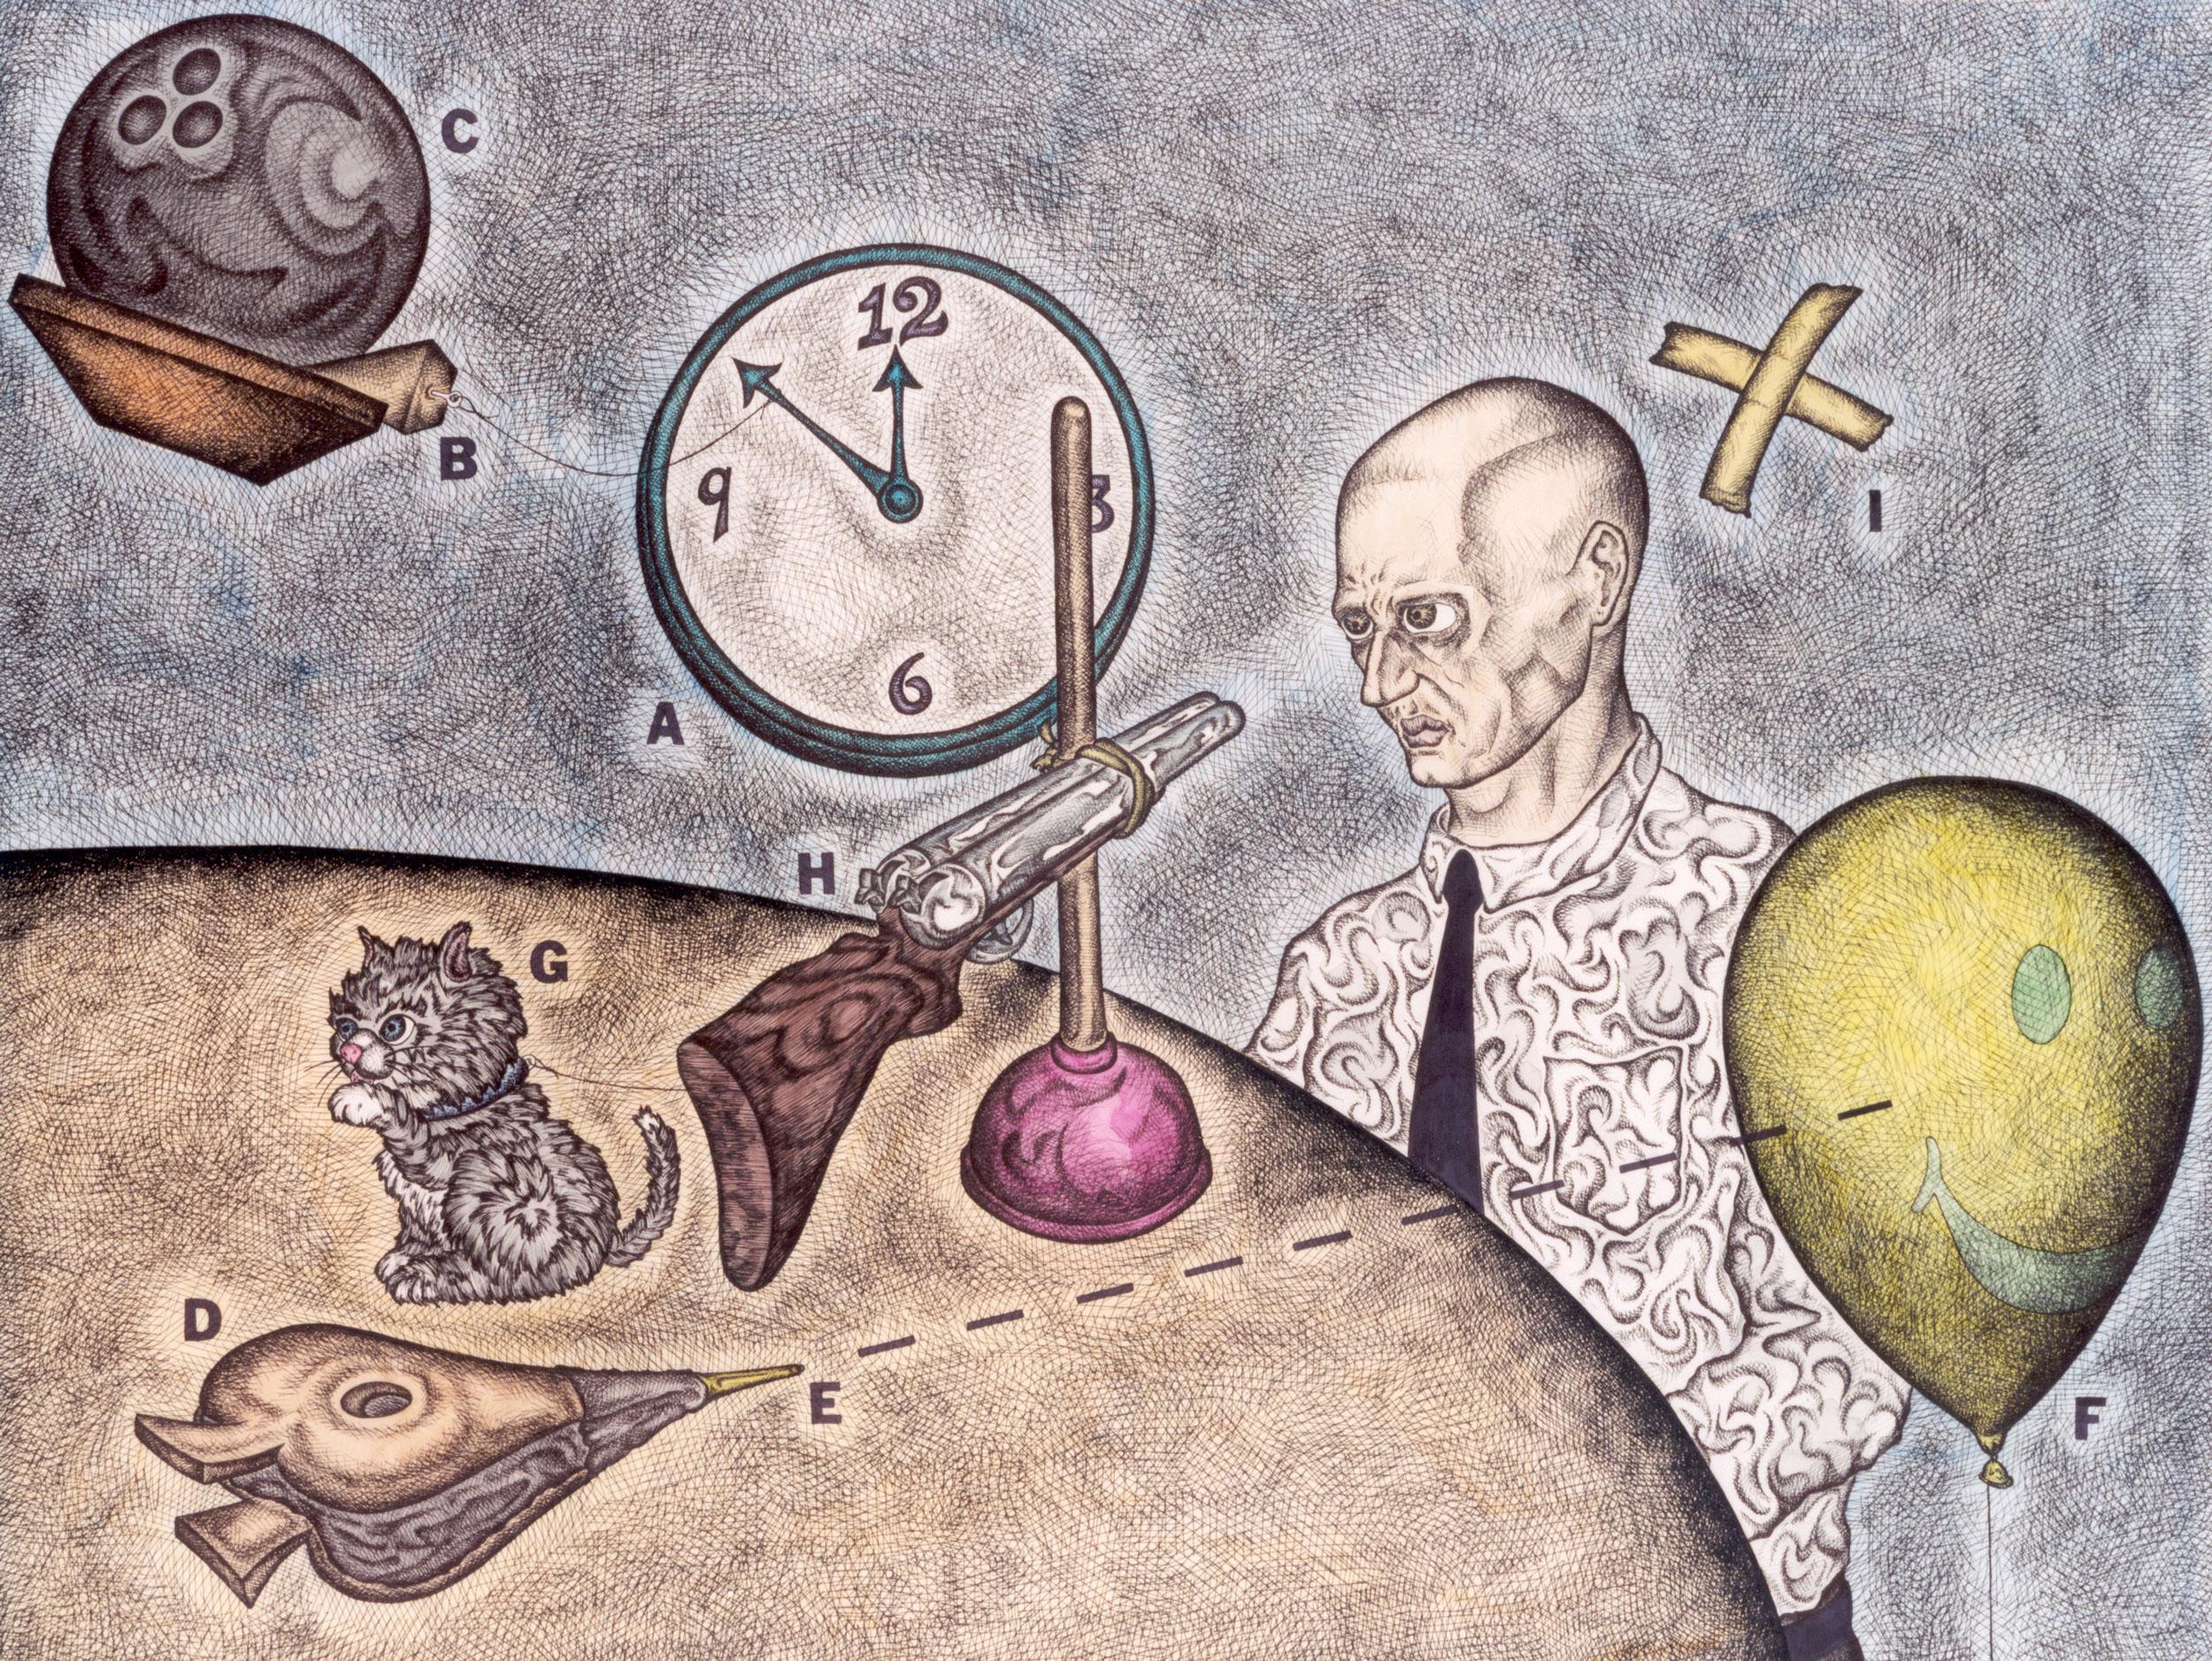 Goldberg/Kevorkian Device